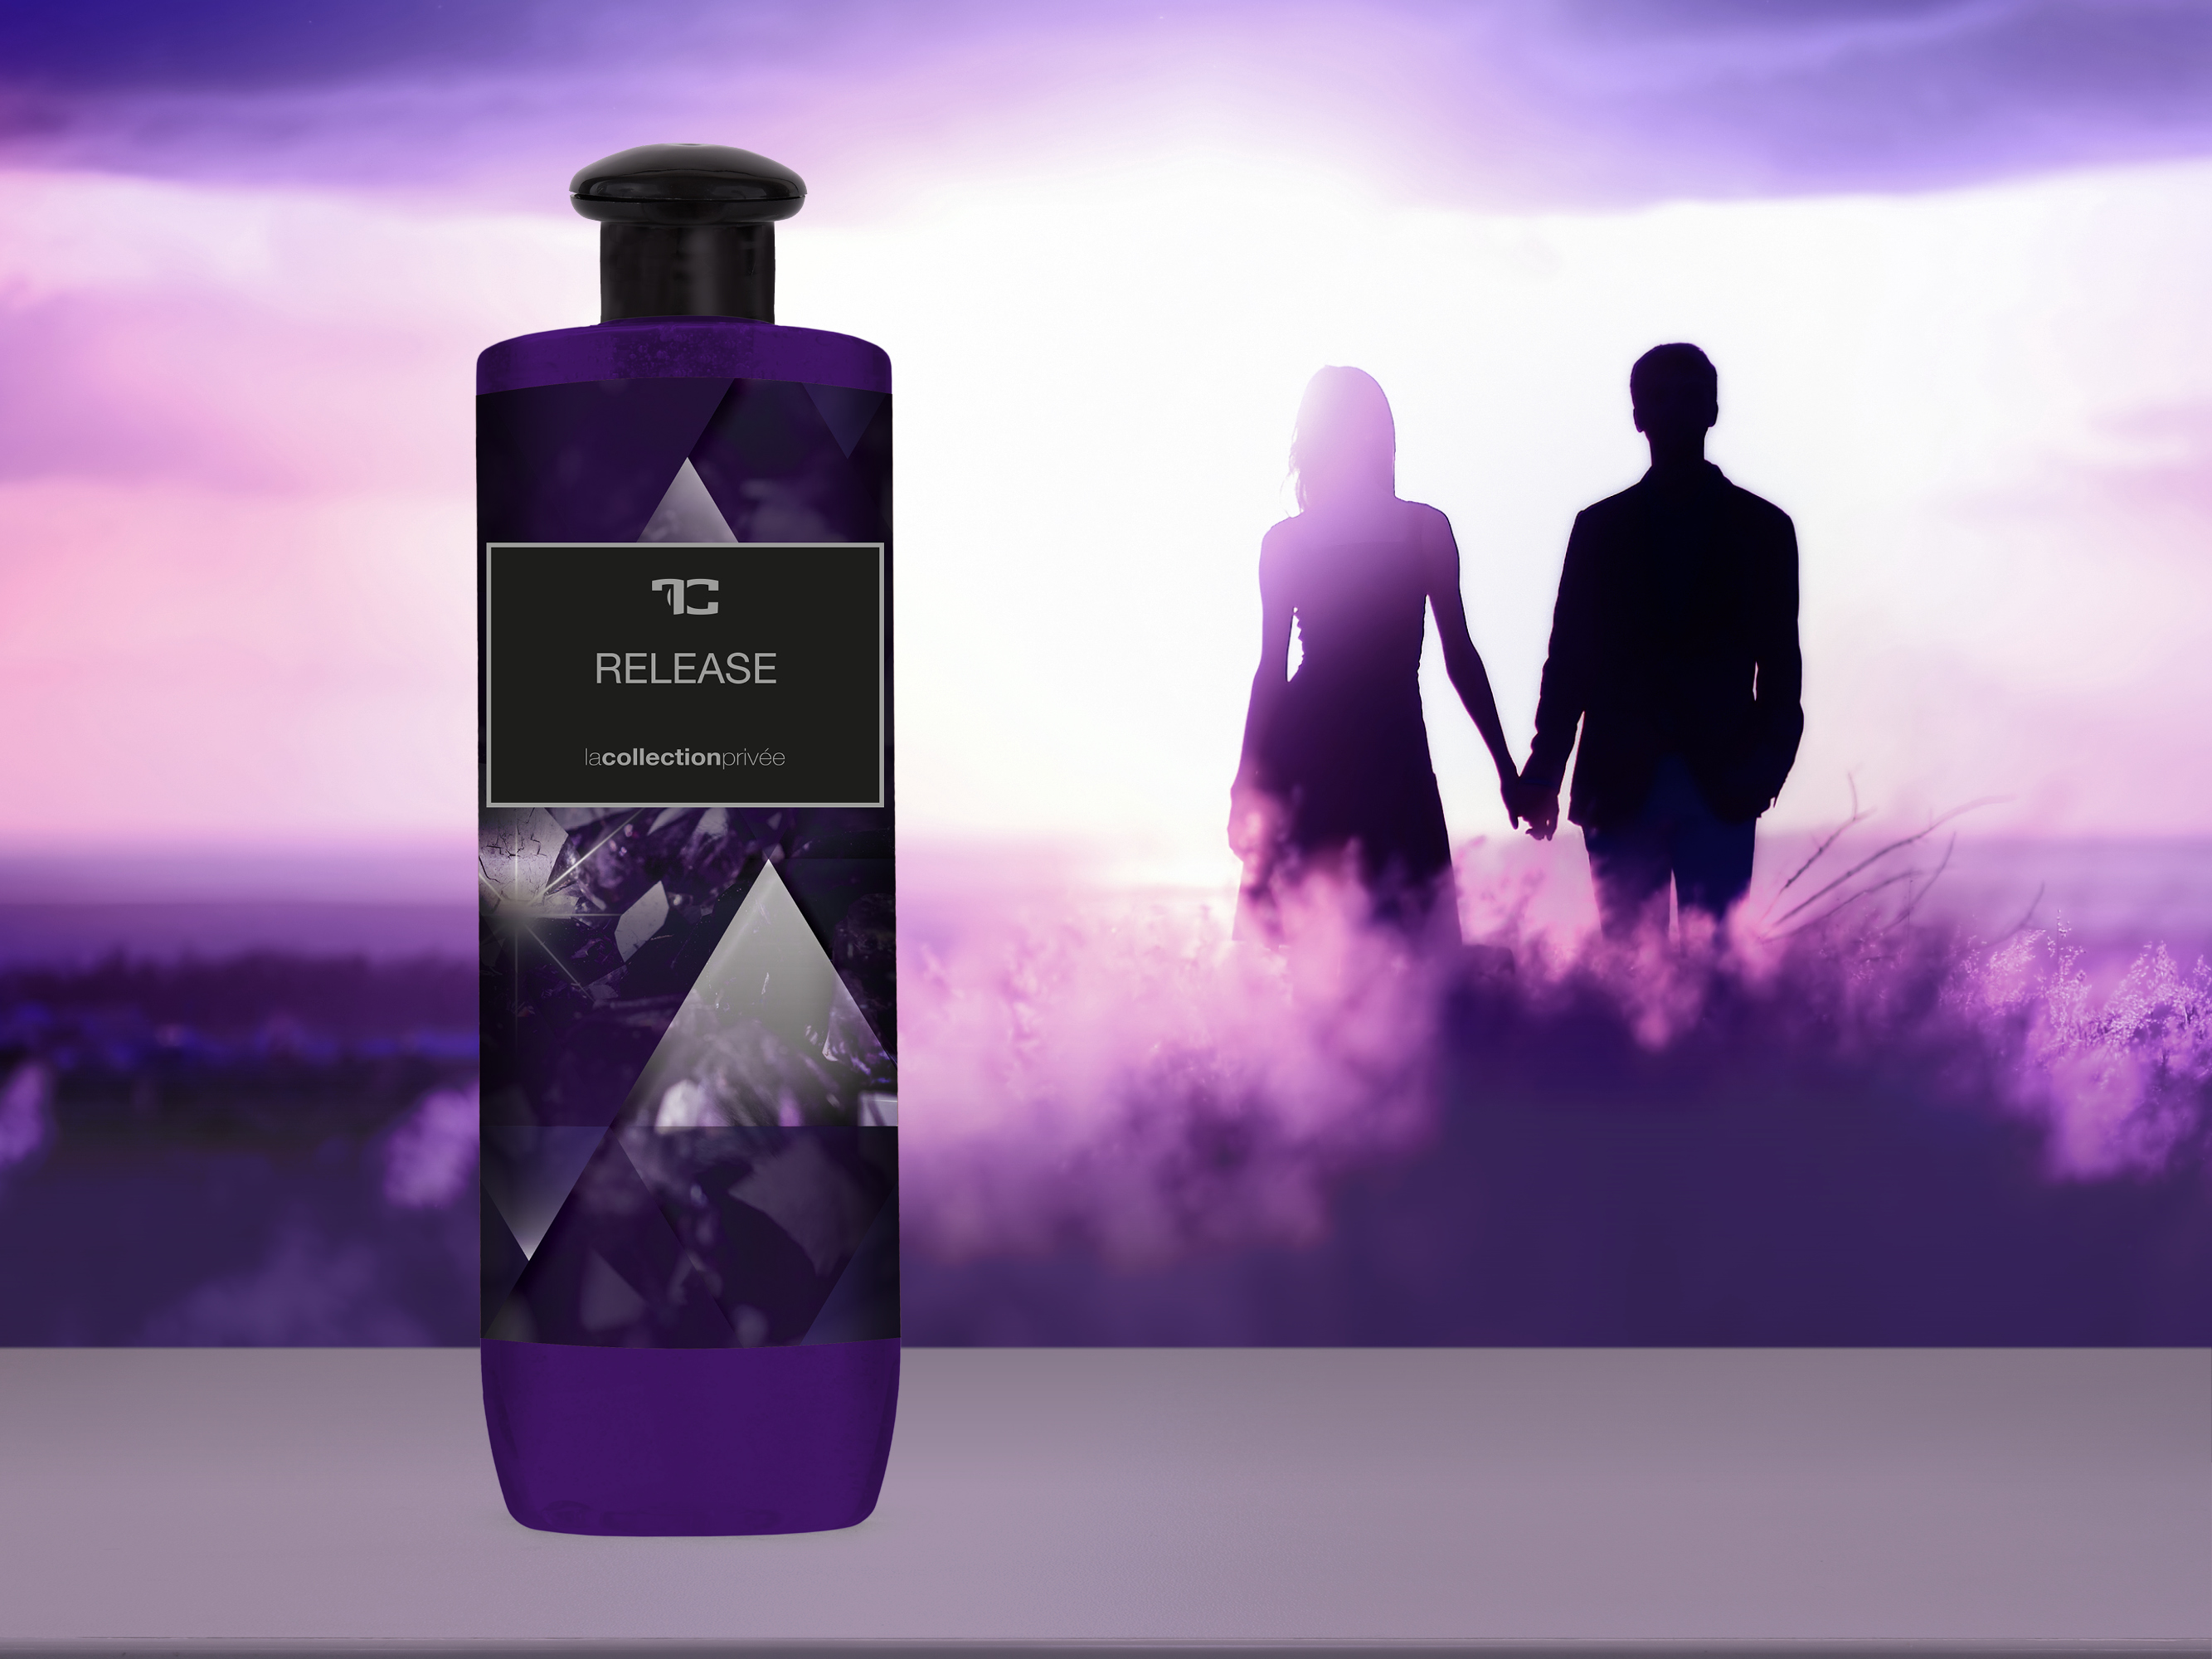 SHOWER CREAM release, sprchový gel, LA COLLECTION PRIVÉE